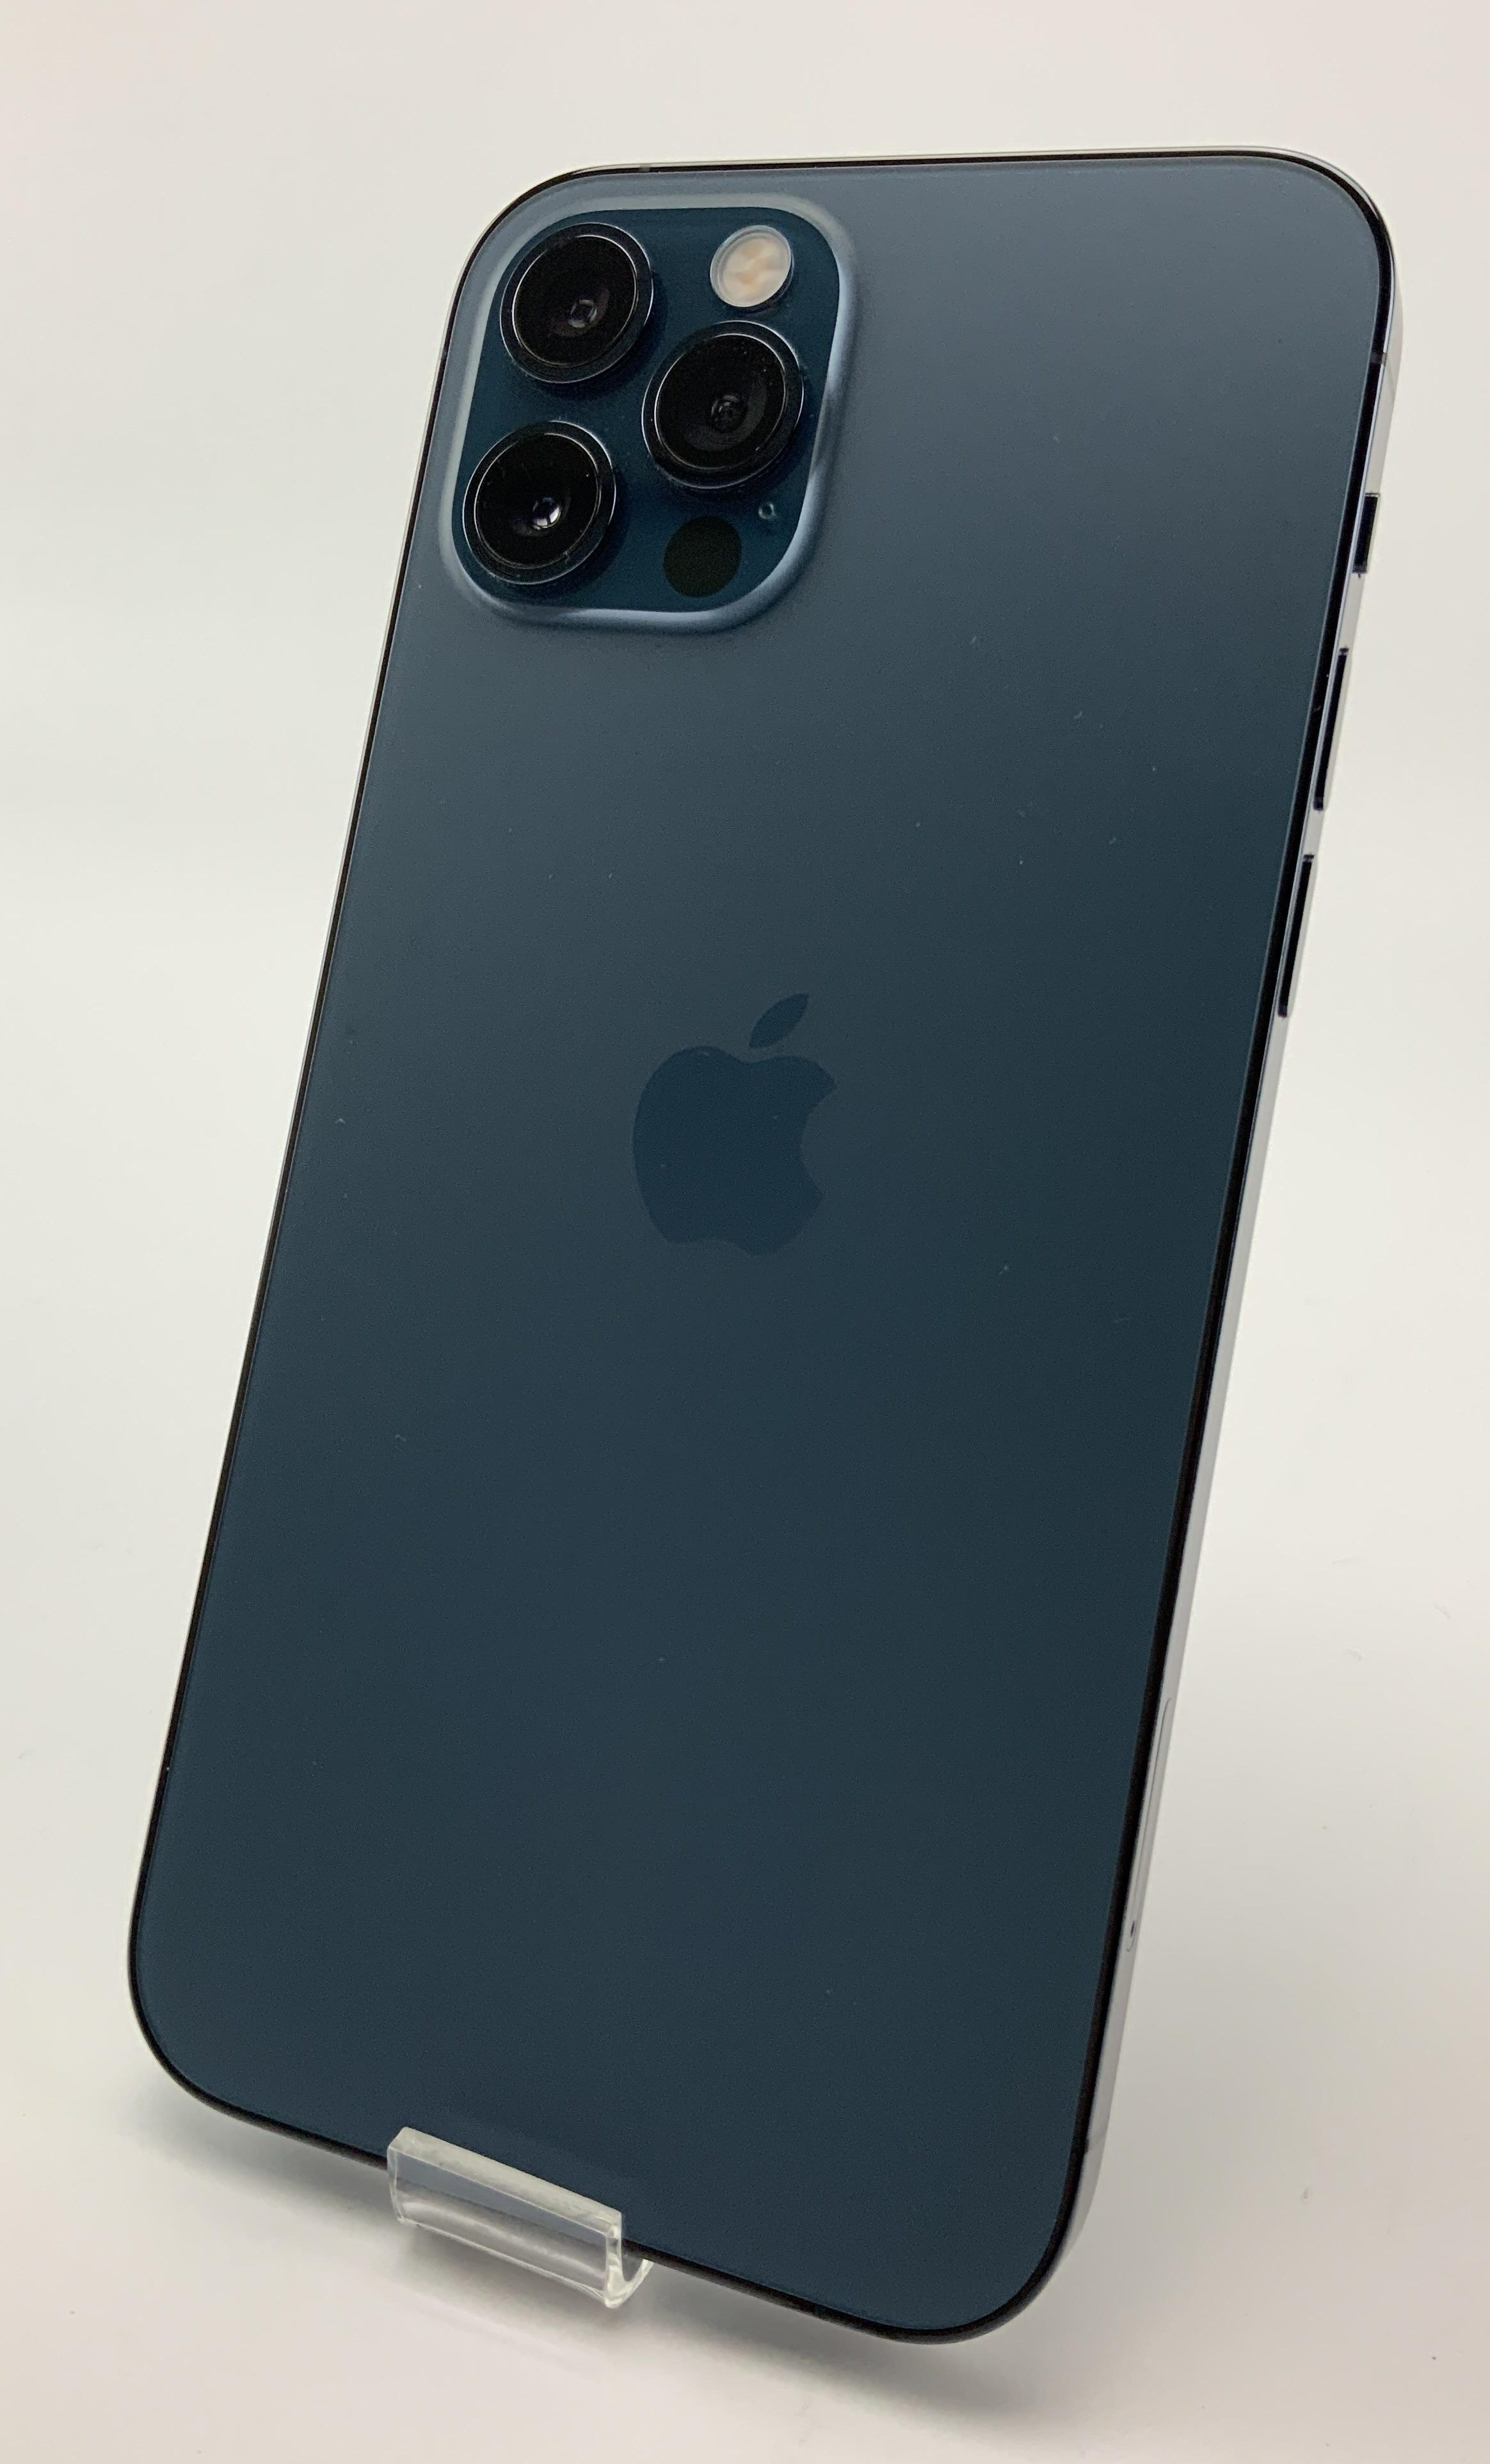 iPhone 12 Pro 512GB, 512GB, Pacific Blue, imagen 2